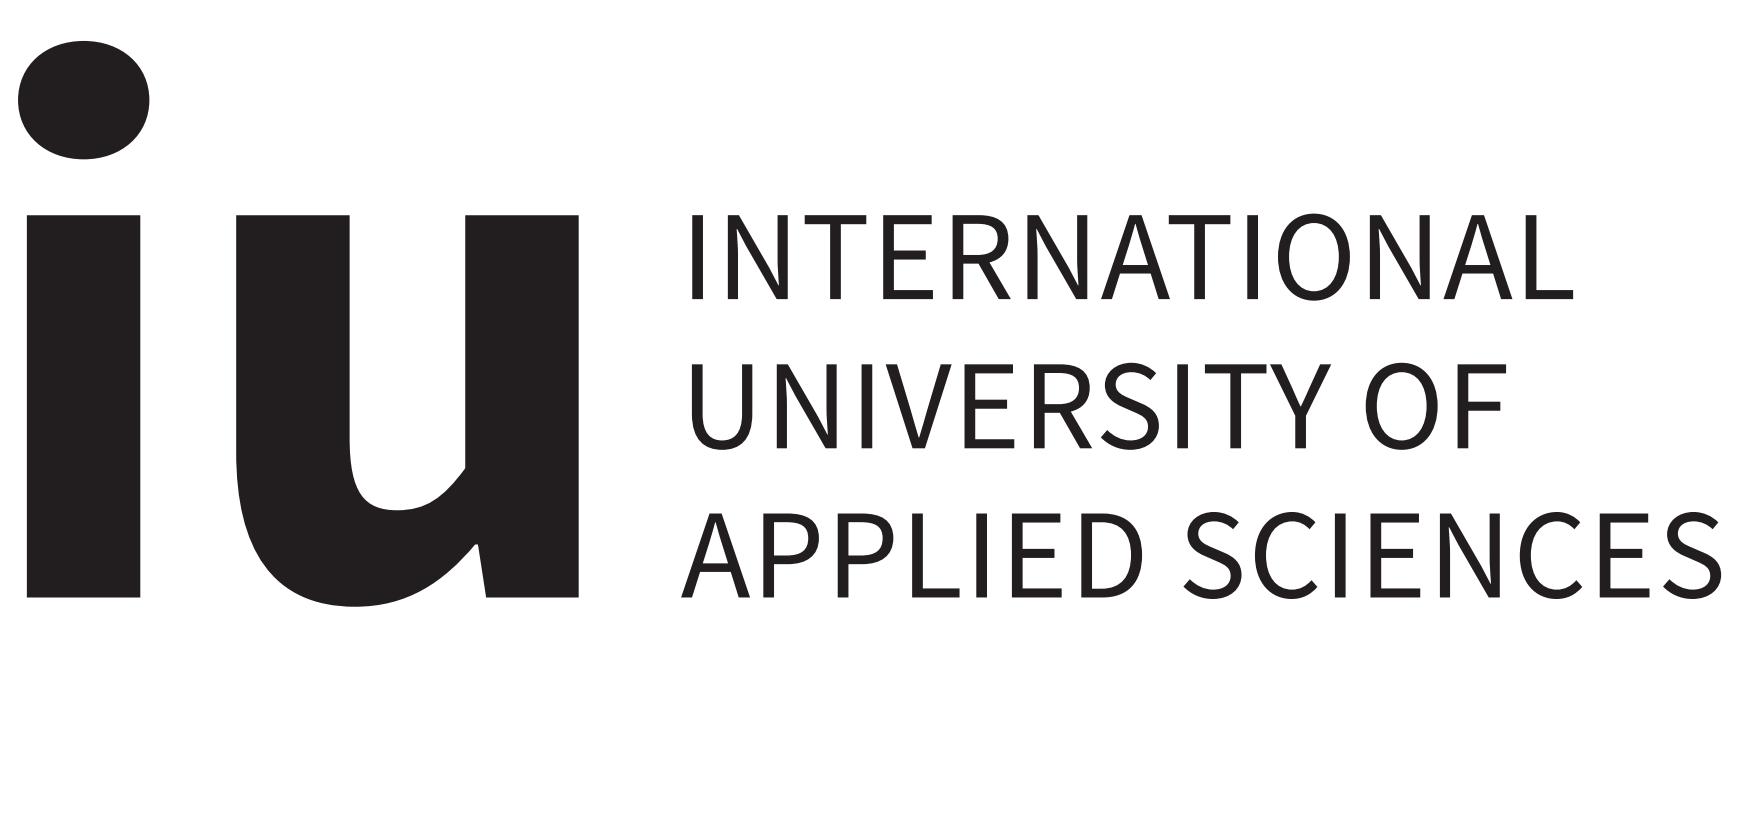 International University of Applied Sciences